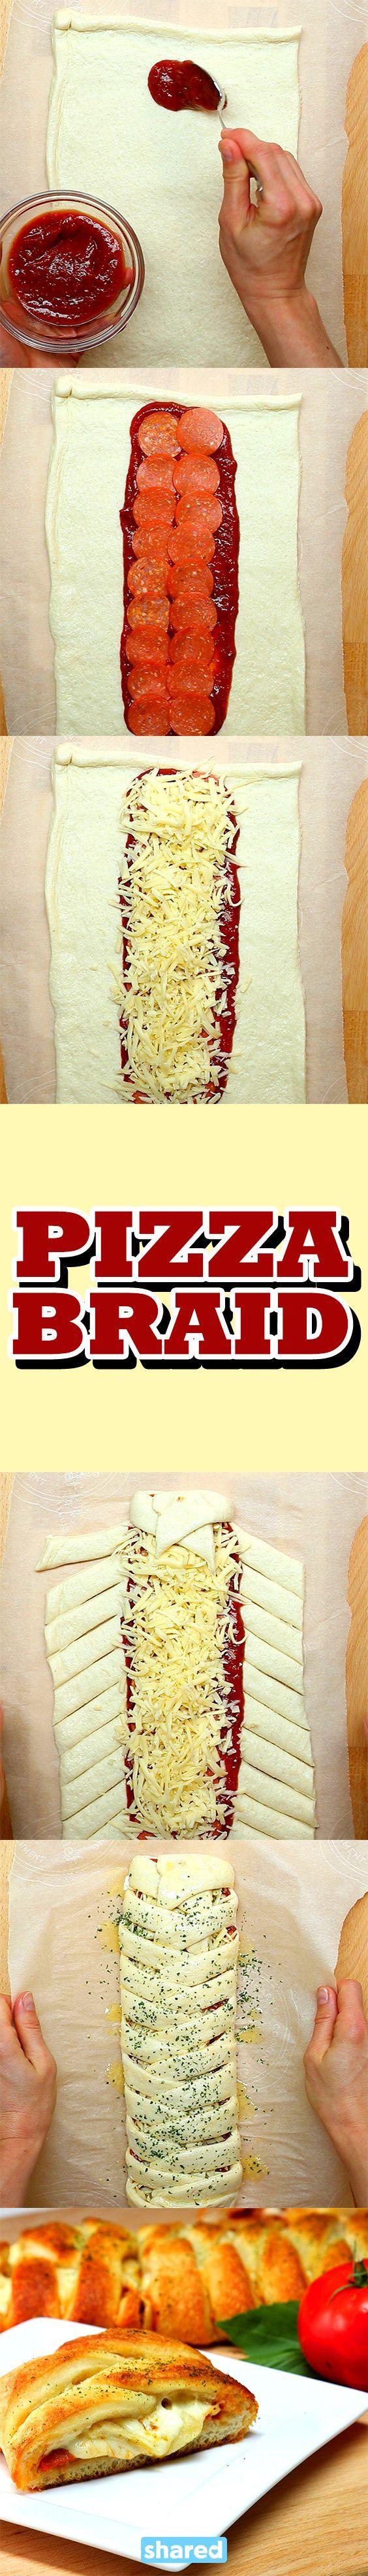 Pizza Braid